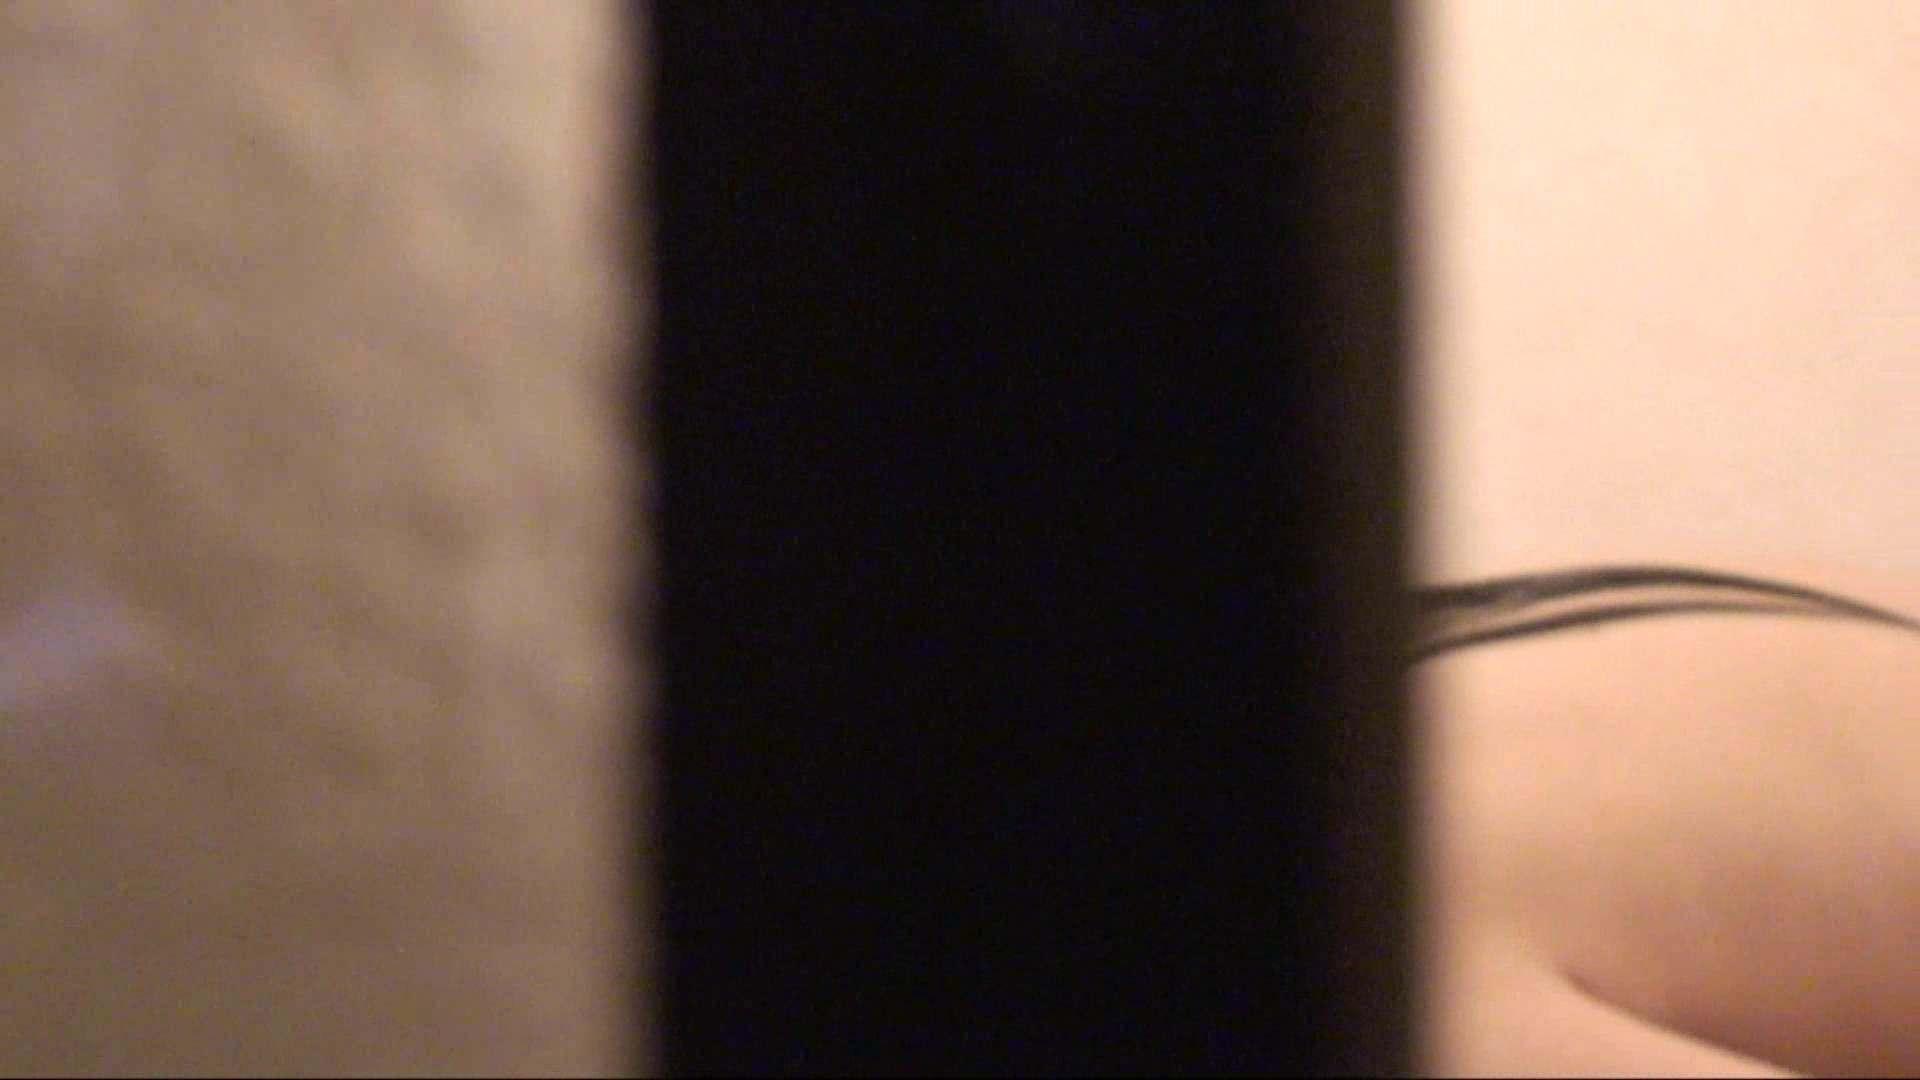 vol.01必見!白肌嬢の乳首が丸見え。極上美人のすっぴん顔をハイビジョンで! 美人 エロ無料画像 89pic 61